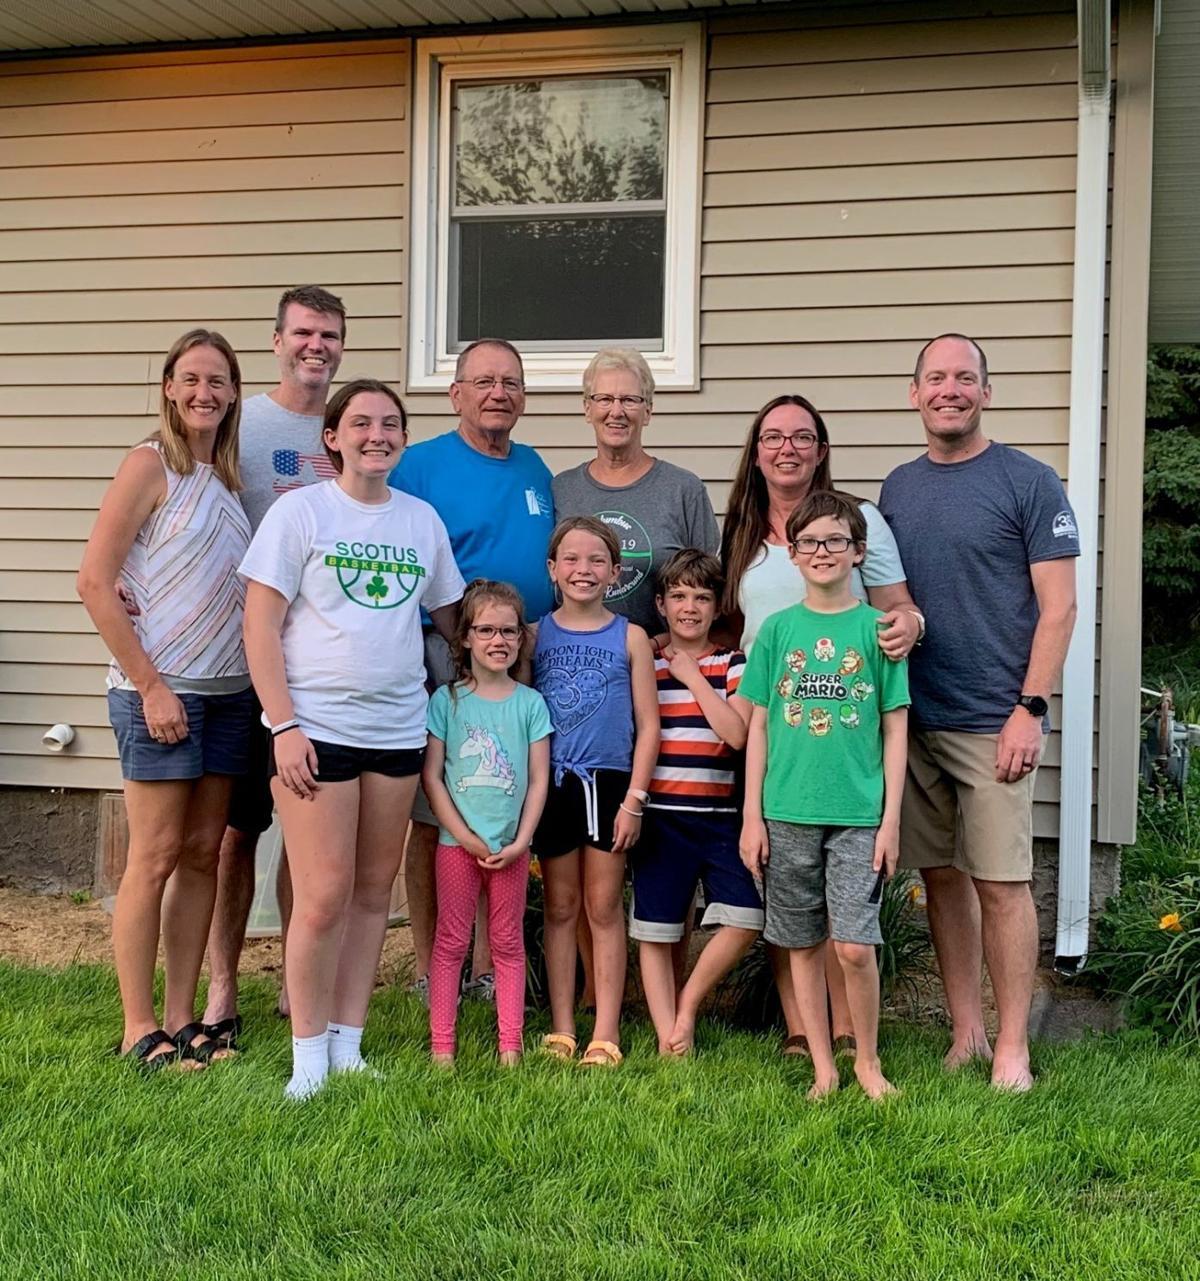 Annette Hash family